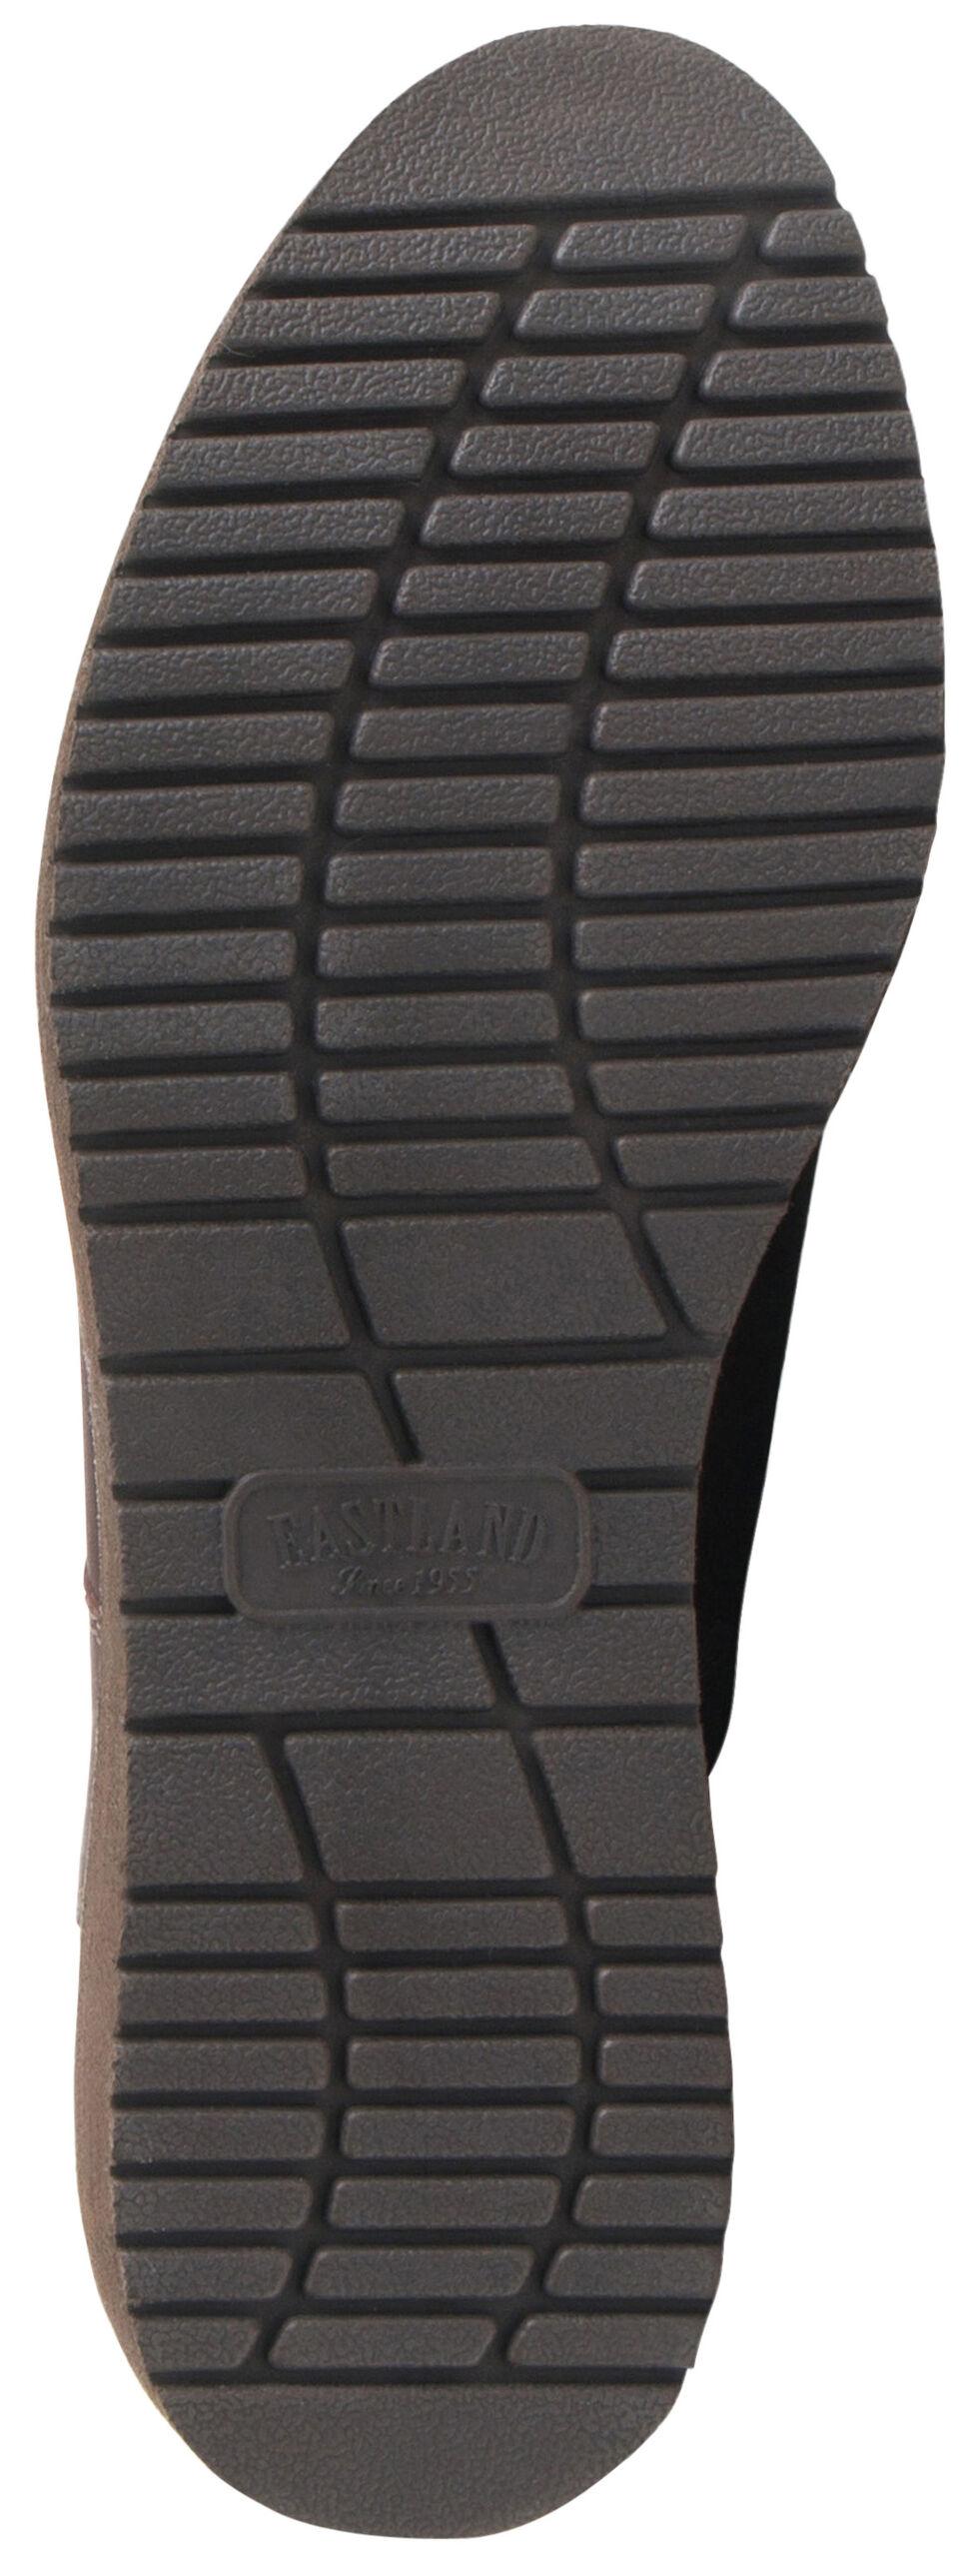 Eastland Women's Dark Walnut Dakota Lace-Up Boots, Brown, hi-res